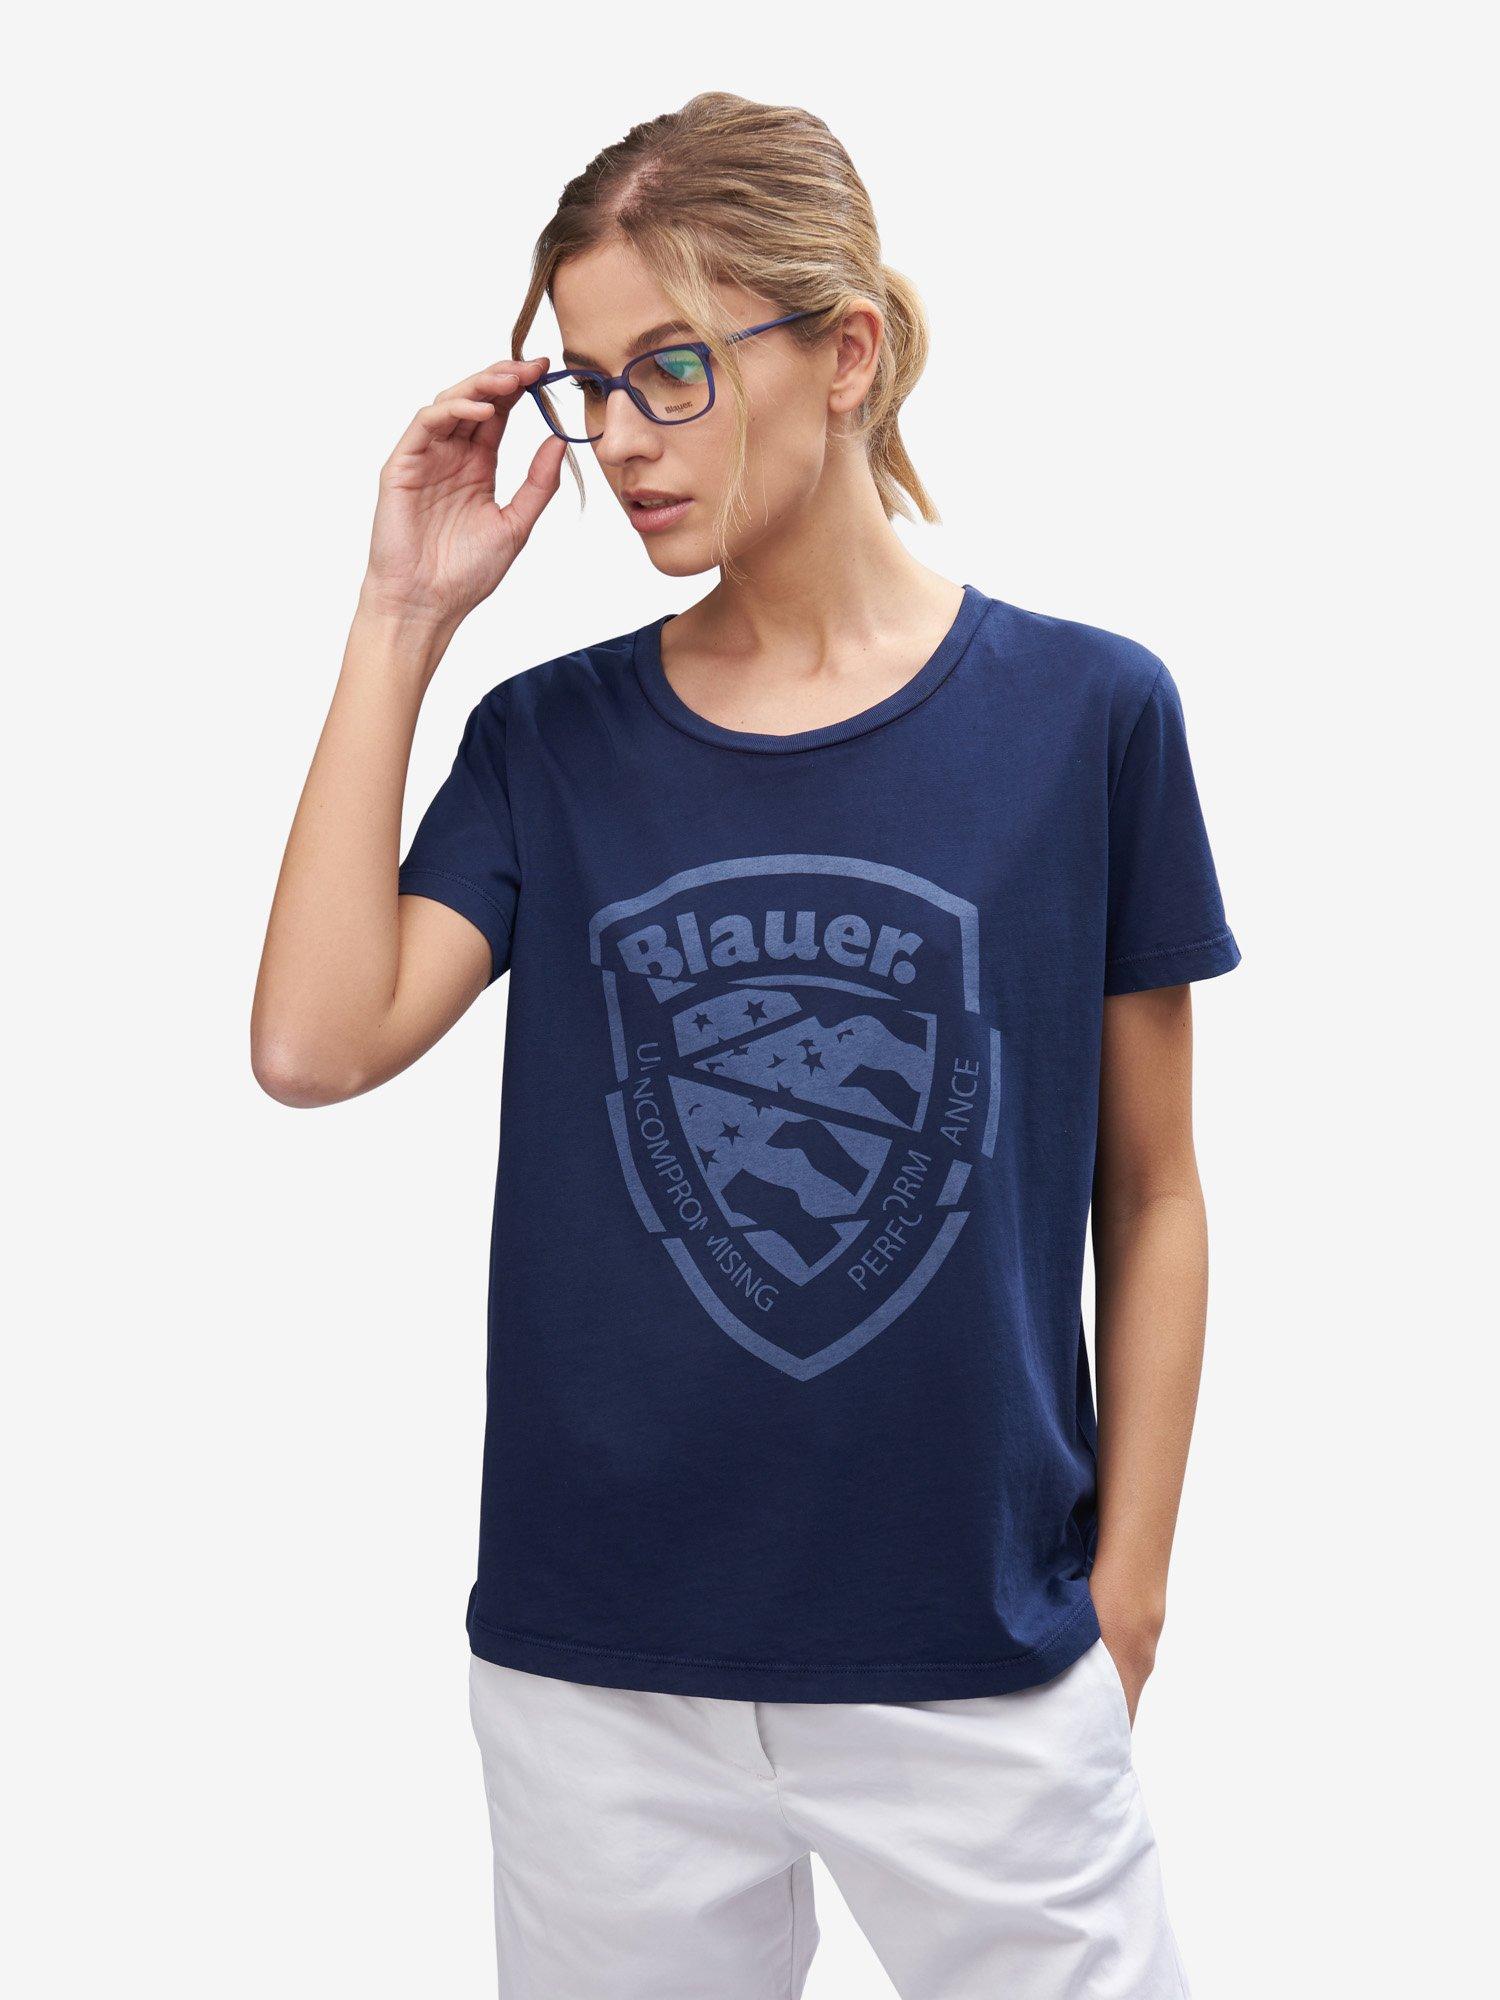 T-SHIRT  MANICA CORTA - Blauer